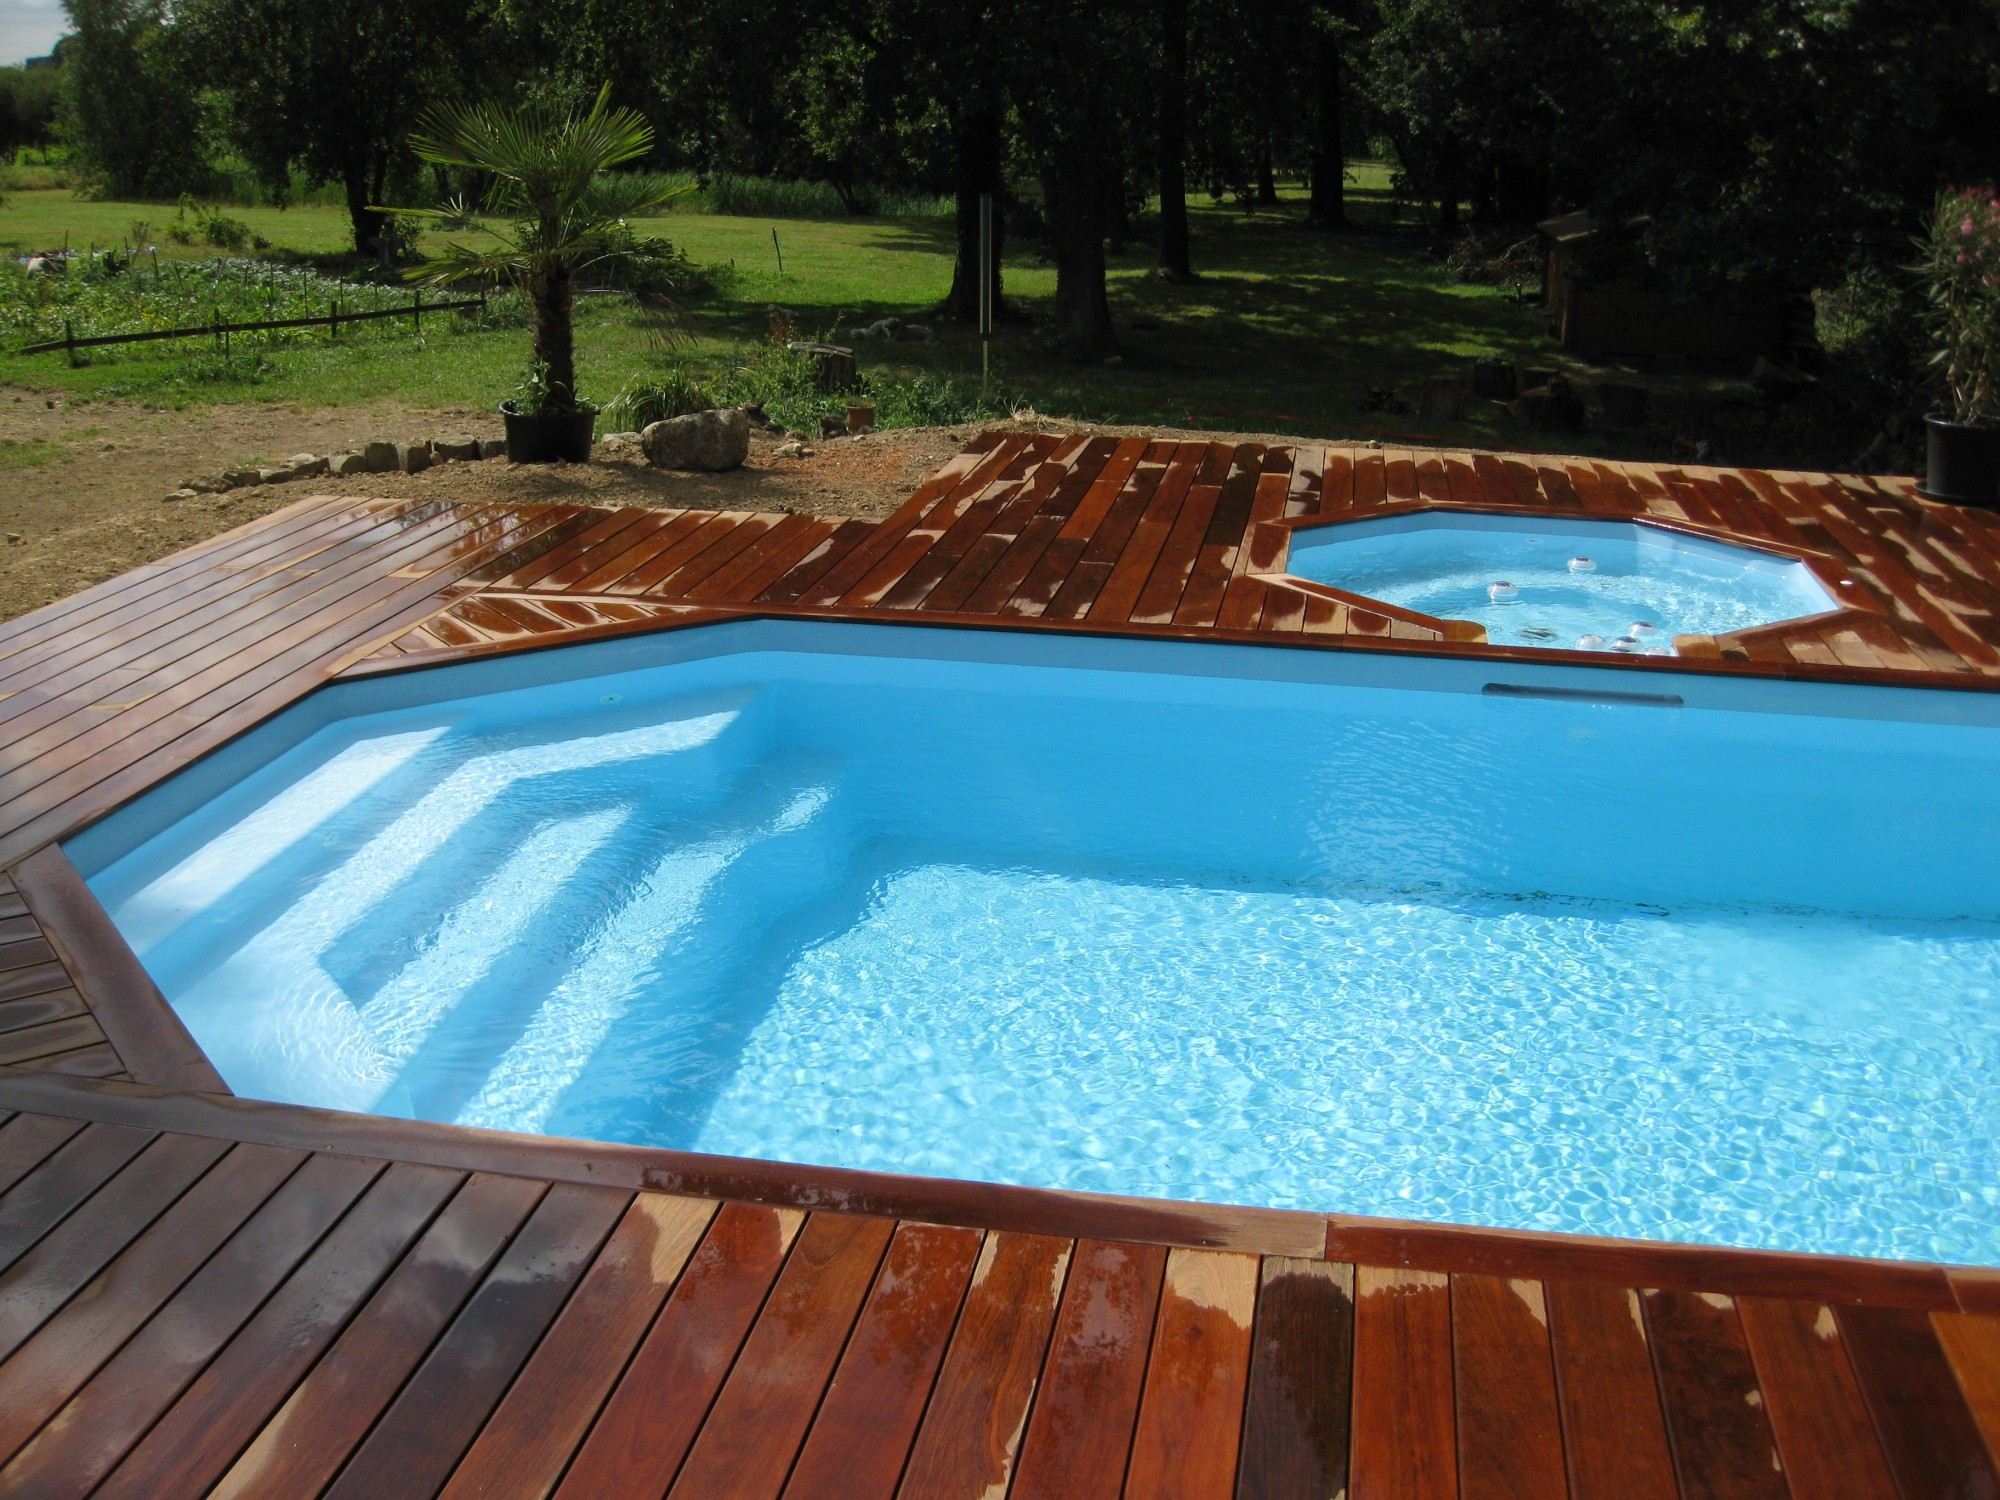 Piscine coque polyester modele lazuli 8 alliances piscines - Renovation piscine coque polyester ...